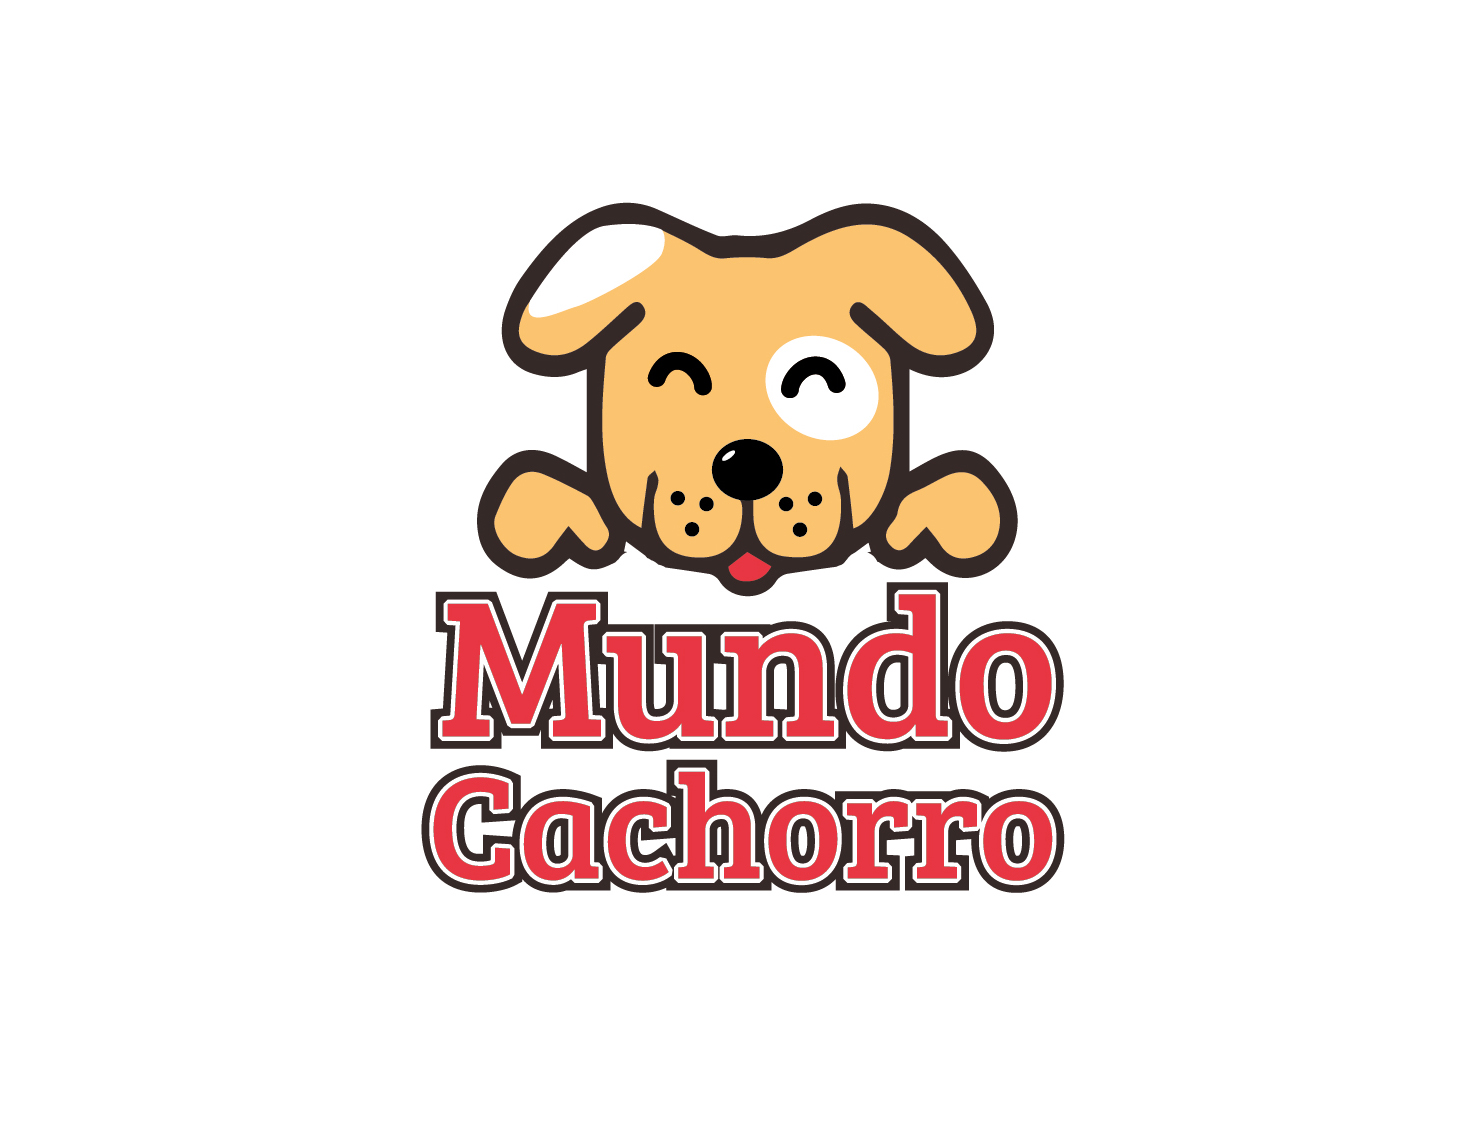 MUNDO CACHORRO